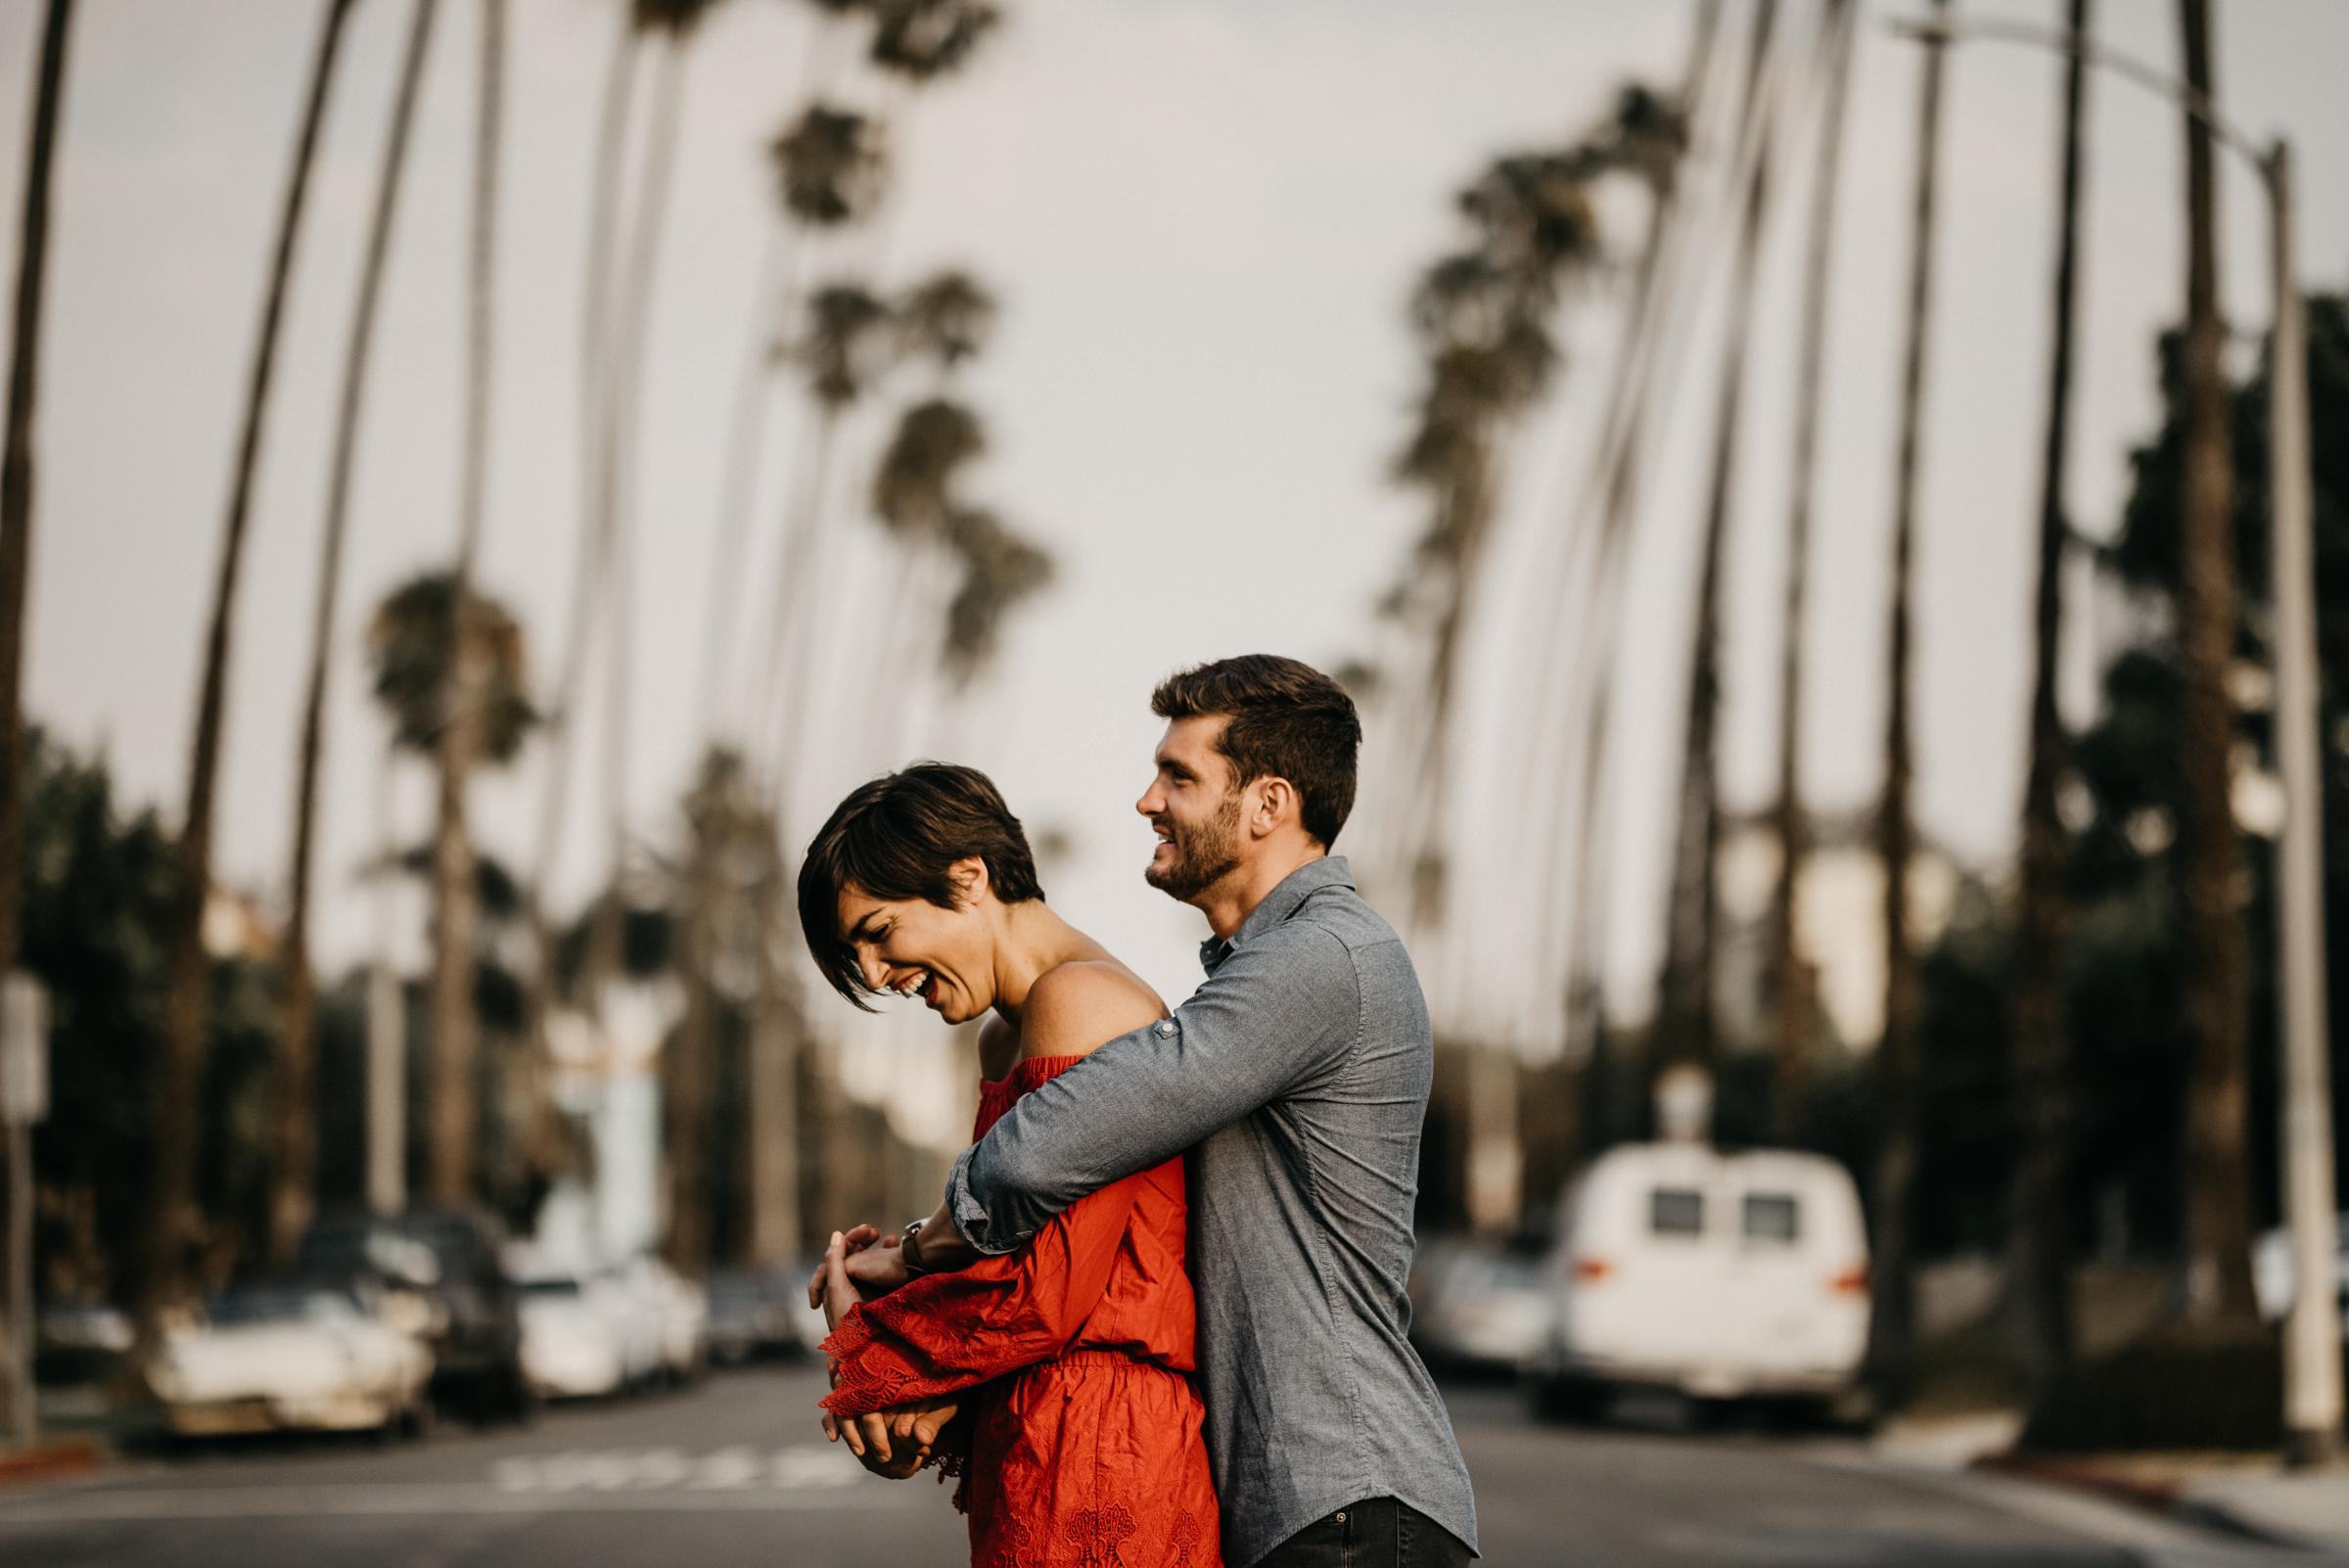 Isaiah + Taylor Photography - Santa Monica Engagement Session, Los Angeles Wedding Photographer-006.jpg